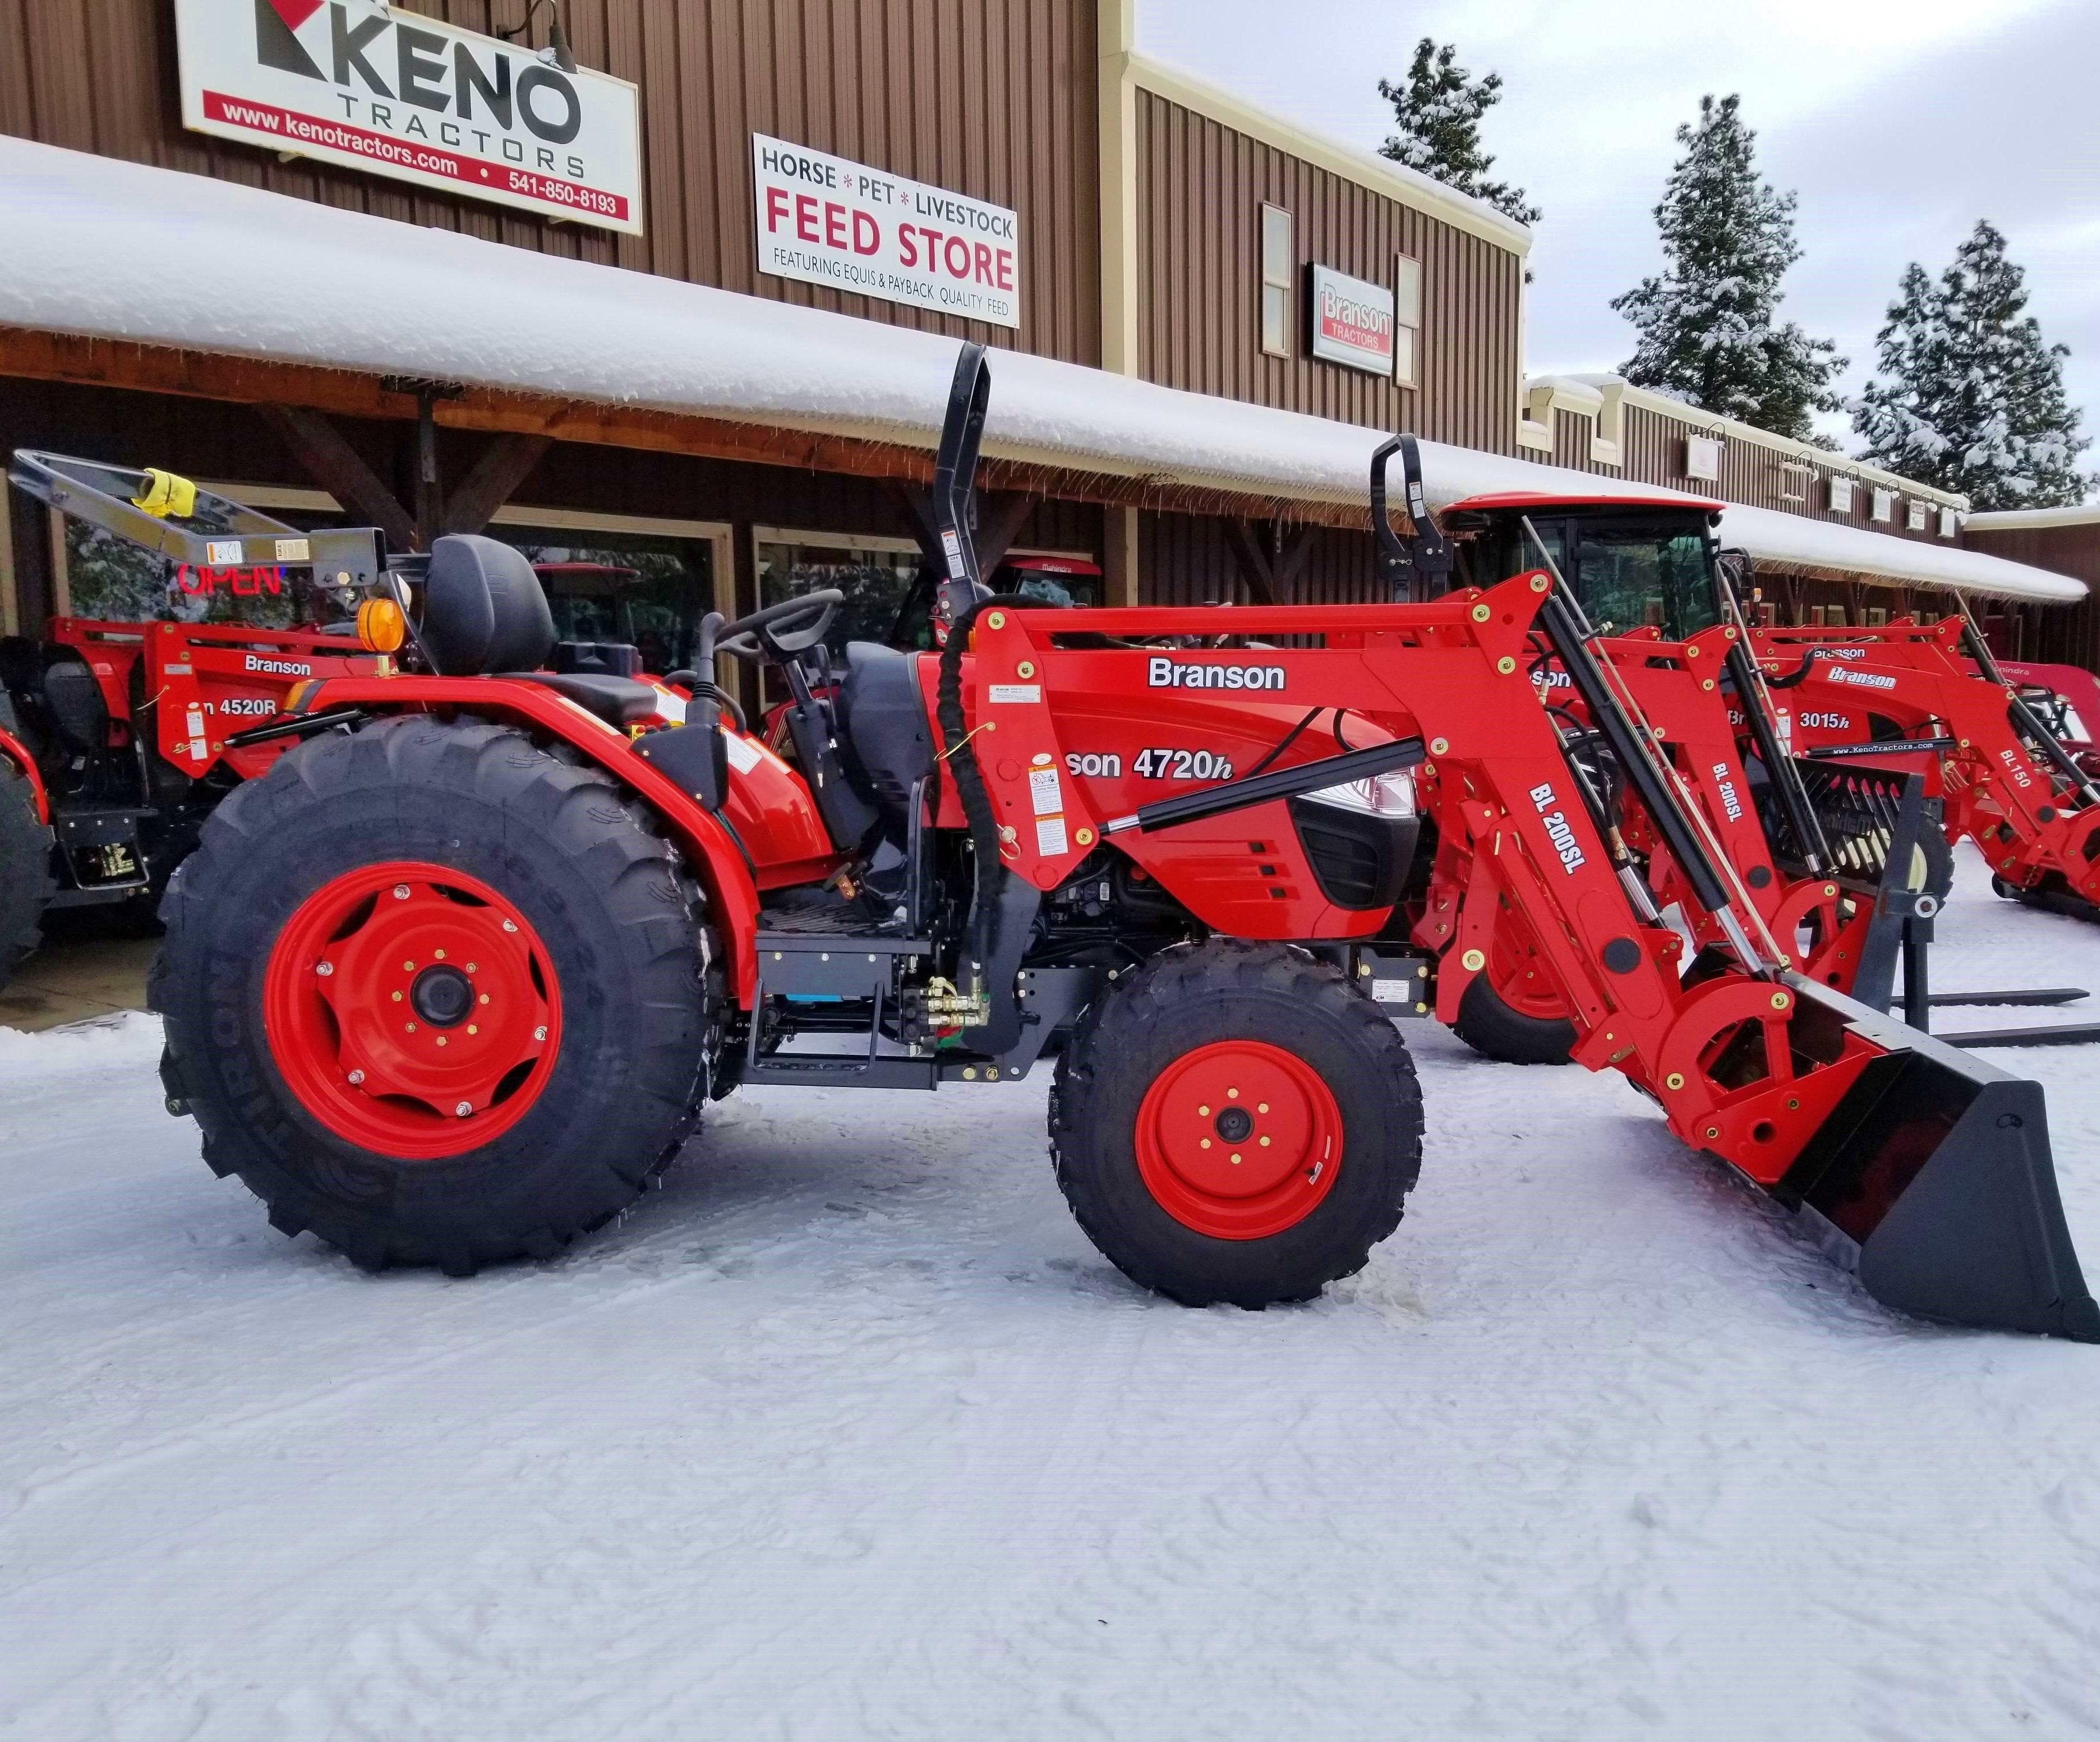 Branson 4820h Tractor Loader